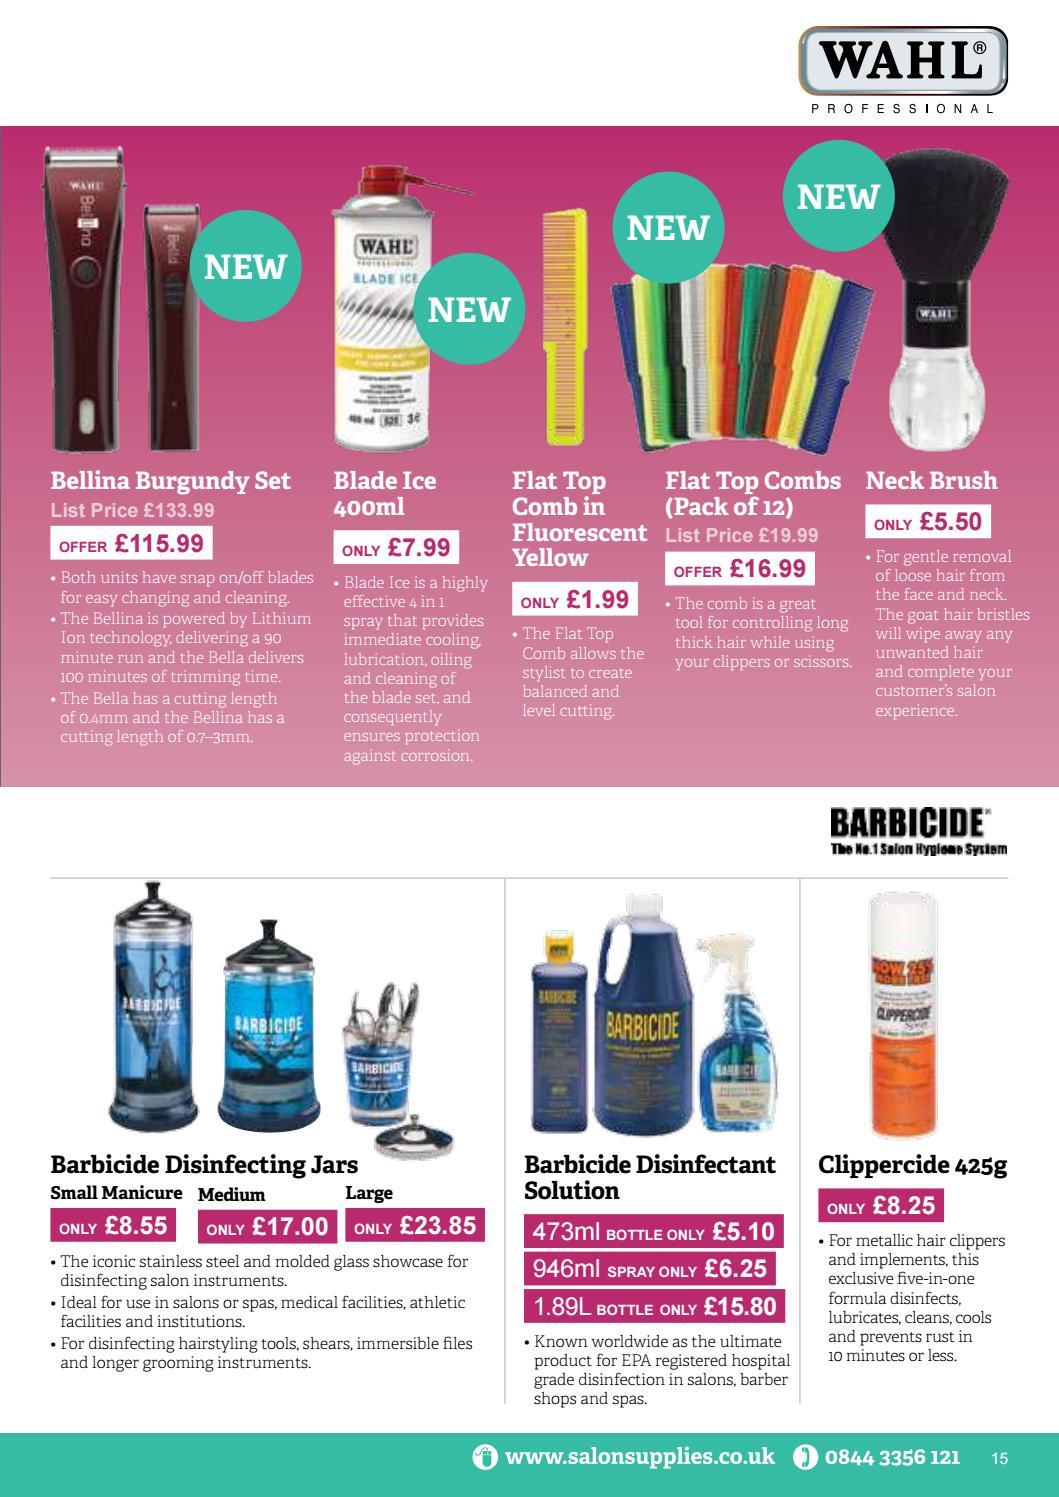 Salon Supplies July - September 2017 Offer Brochure by Salon